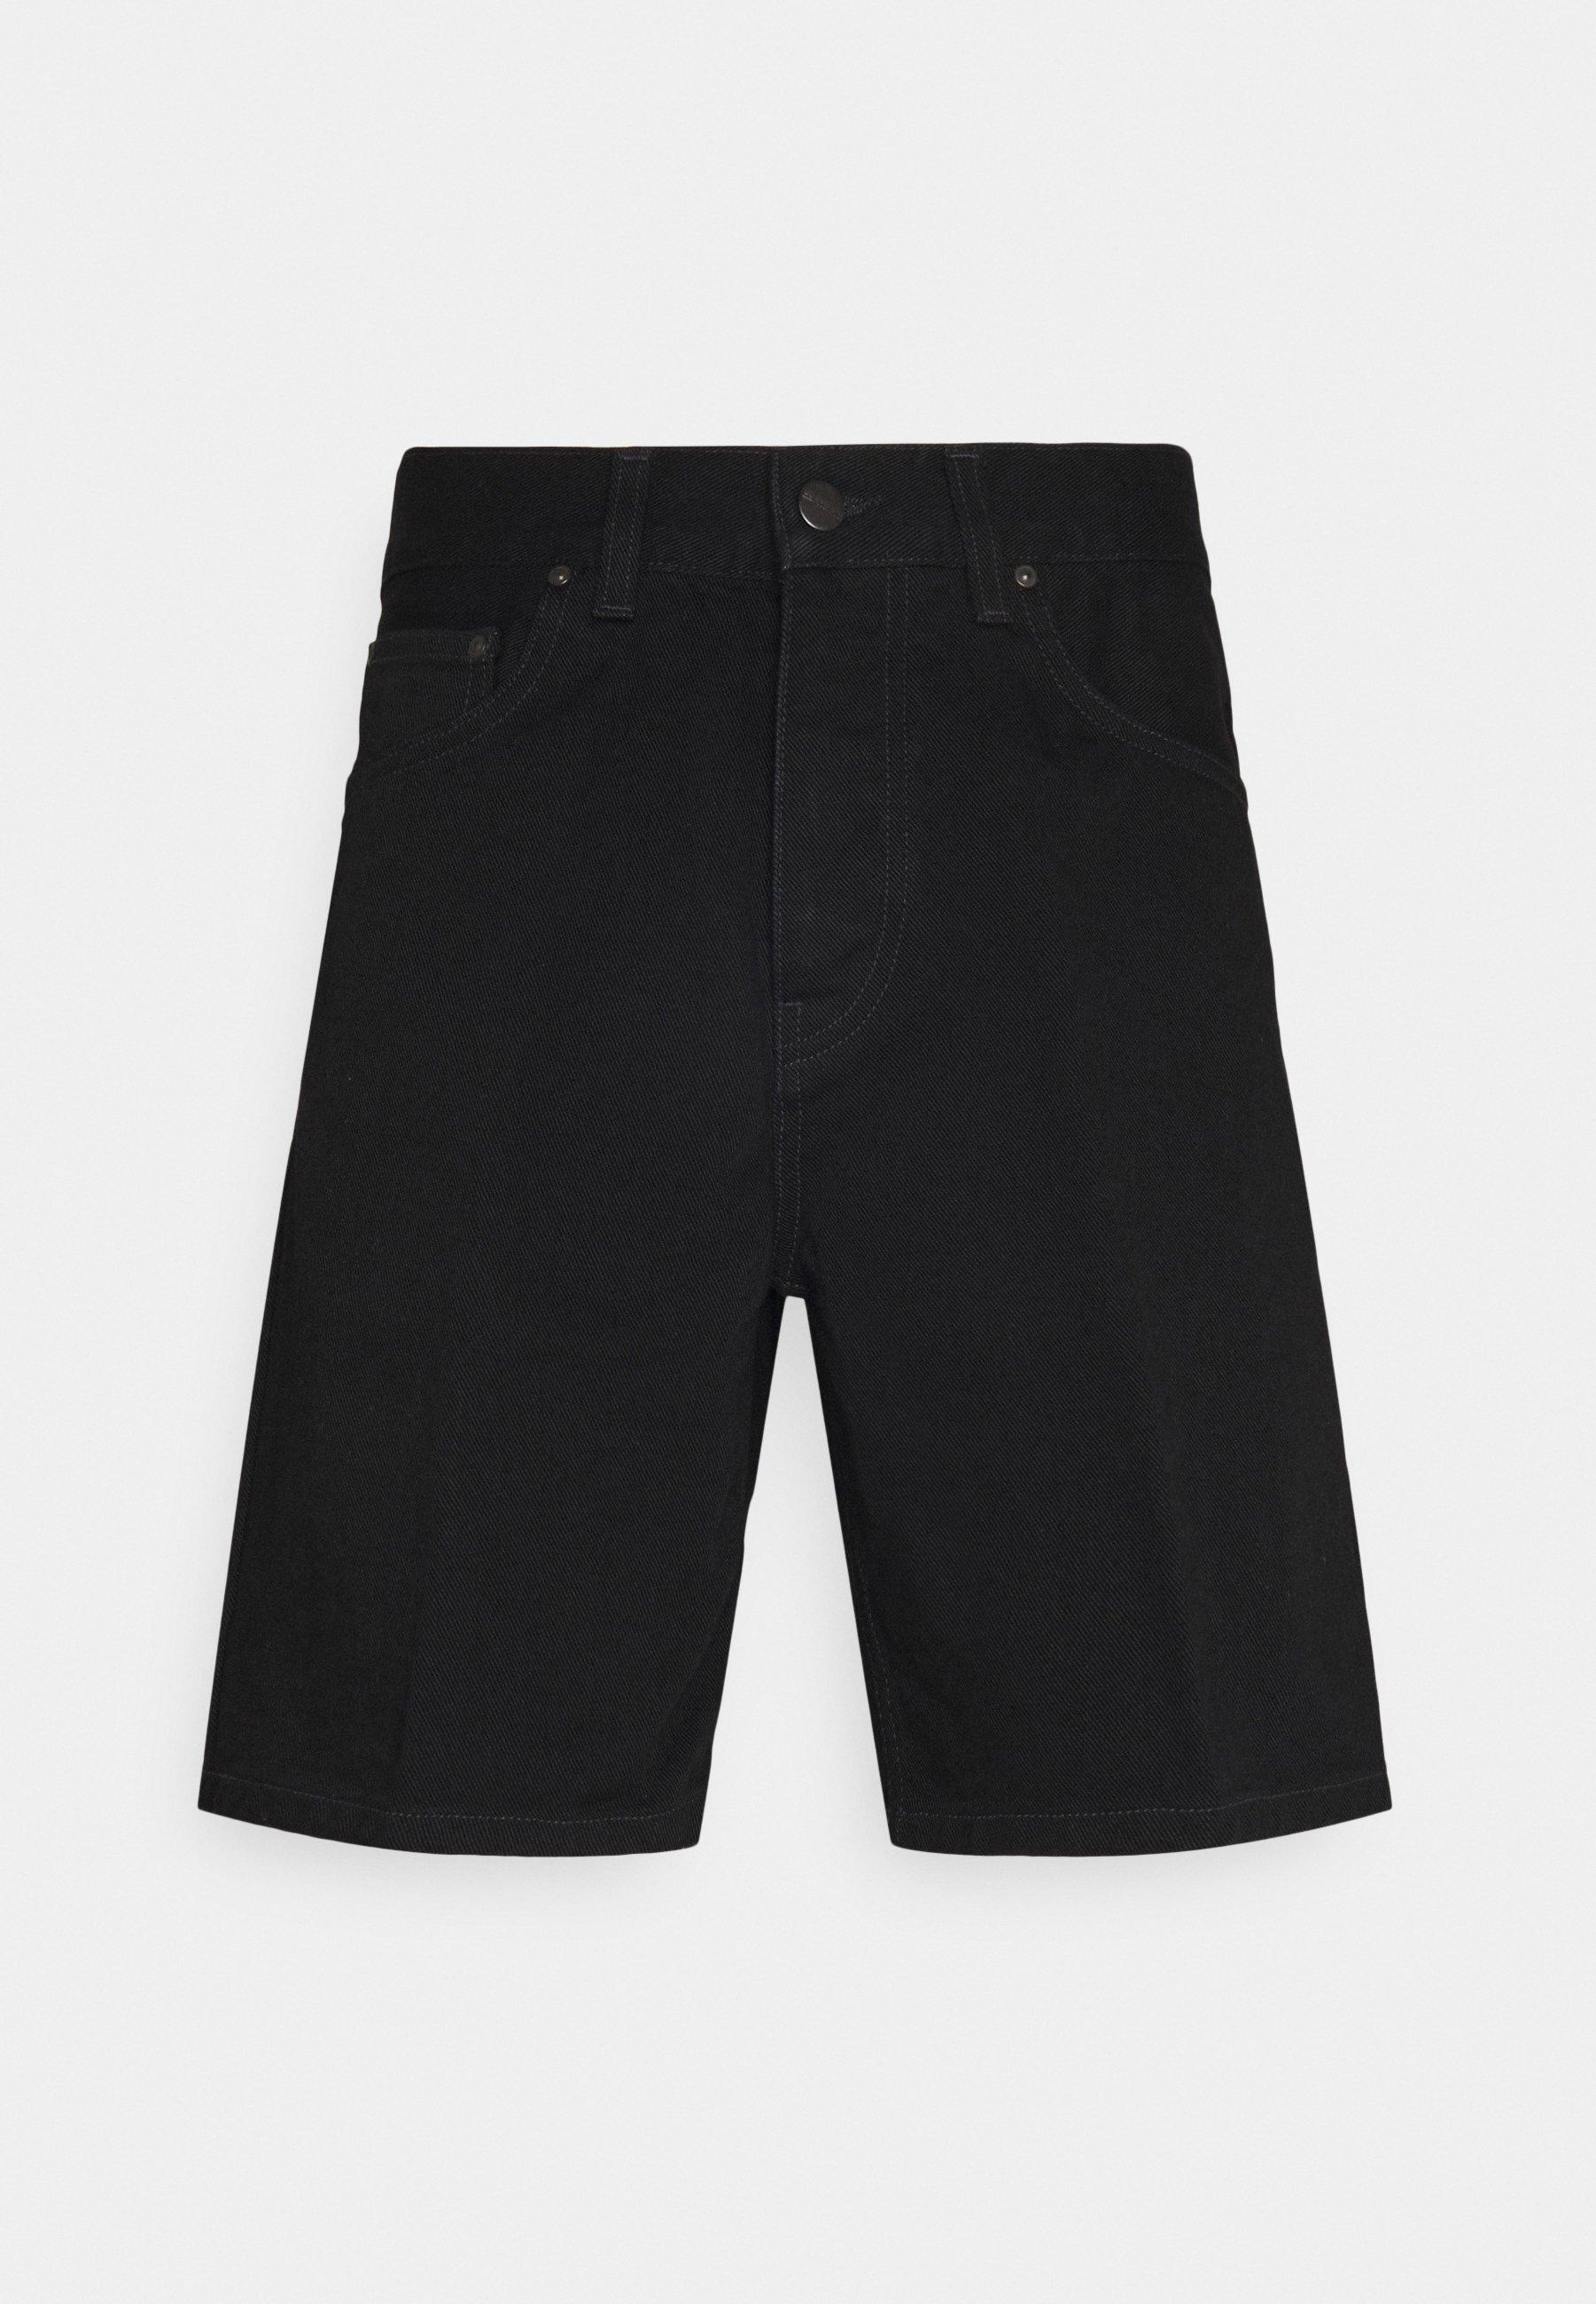 Homme NEWEL MAITLAND - Short en jean